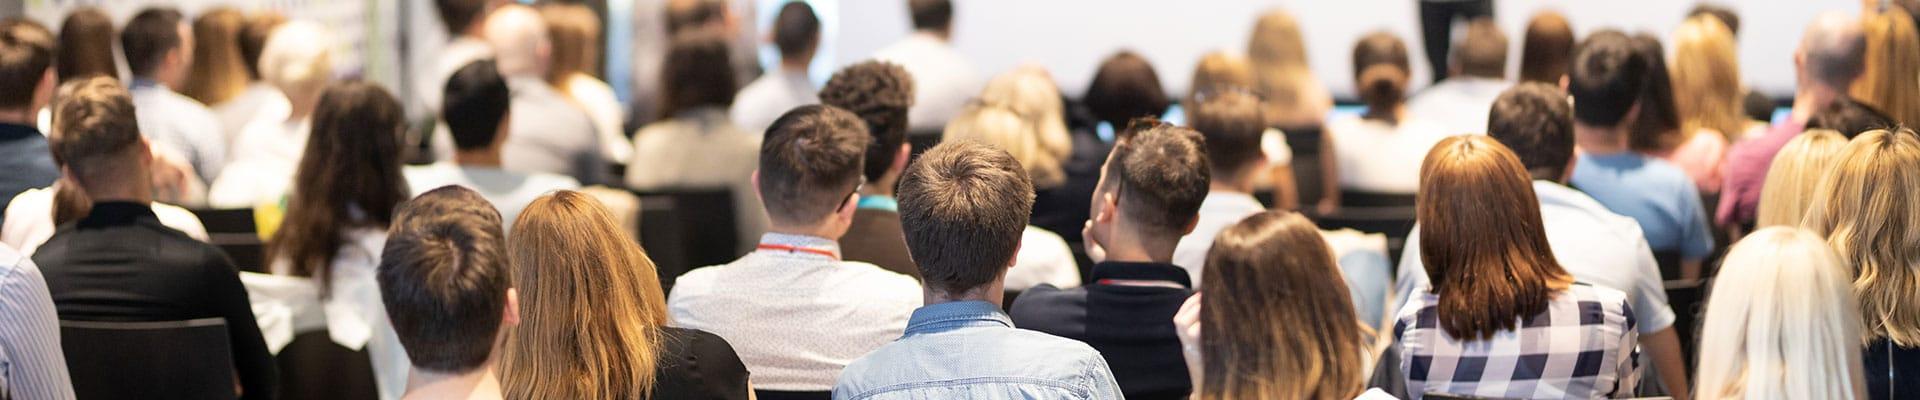 Public Speaking Australia Conference Presentations